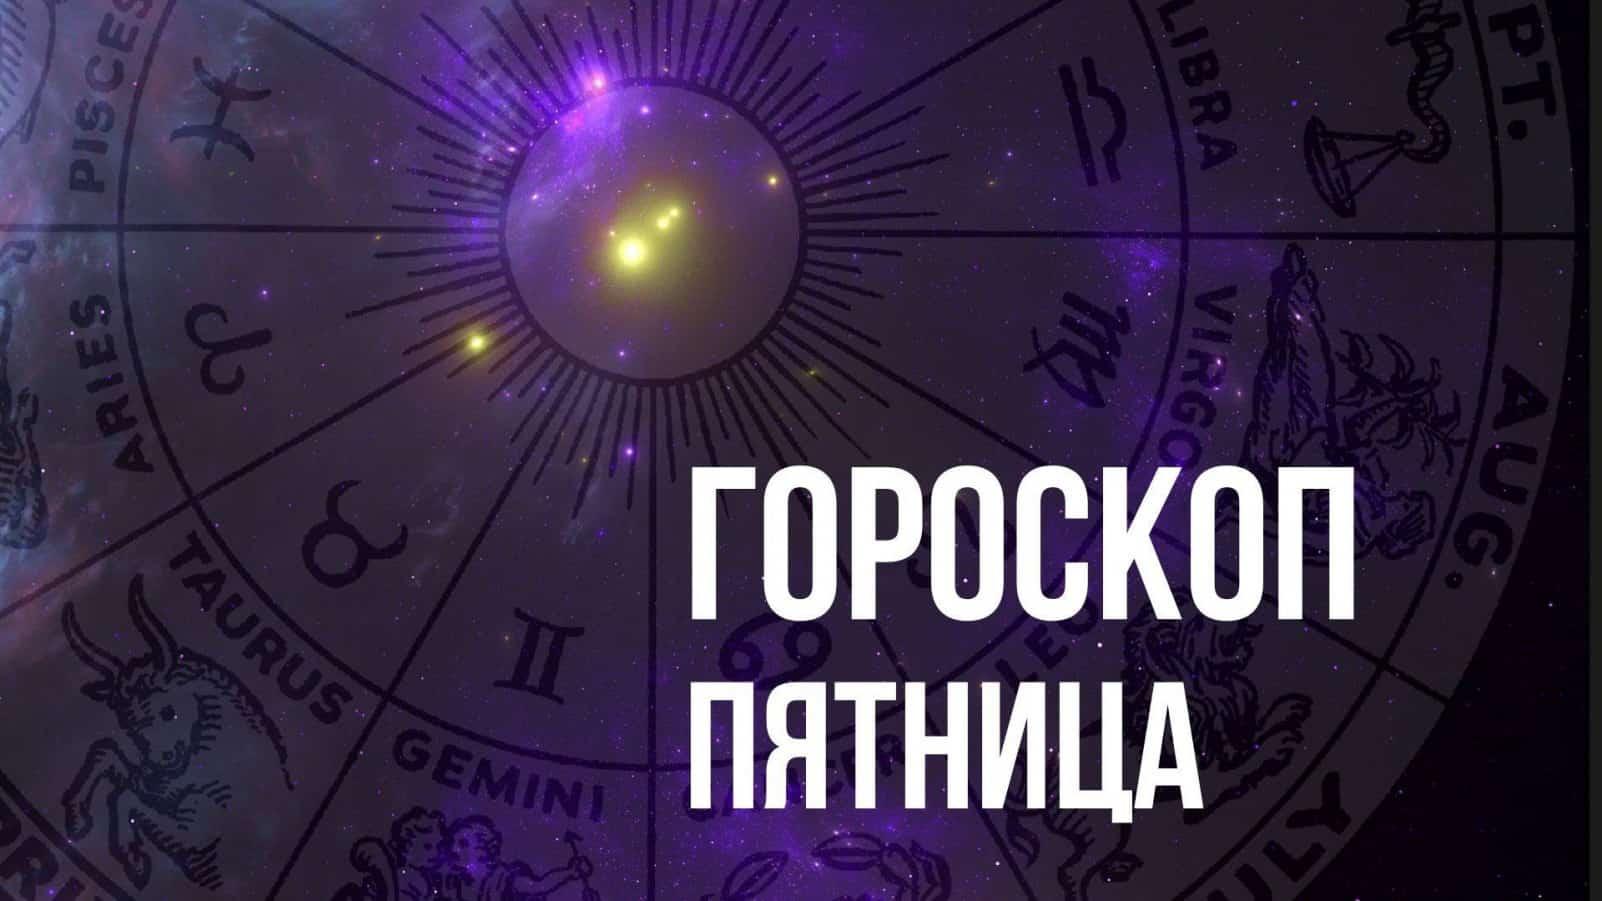 Гороскоп на пятницу 7 мая для каждого знака Зодиака